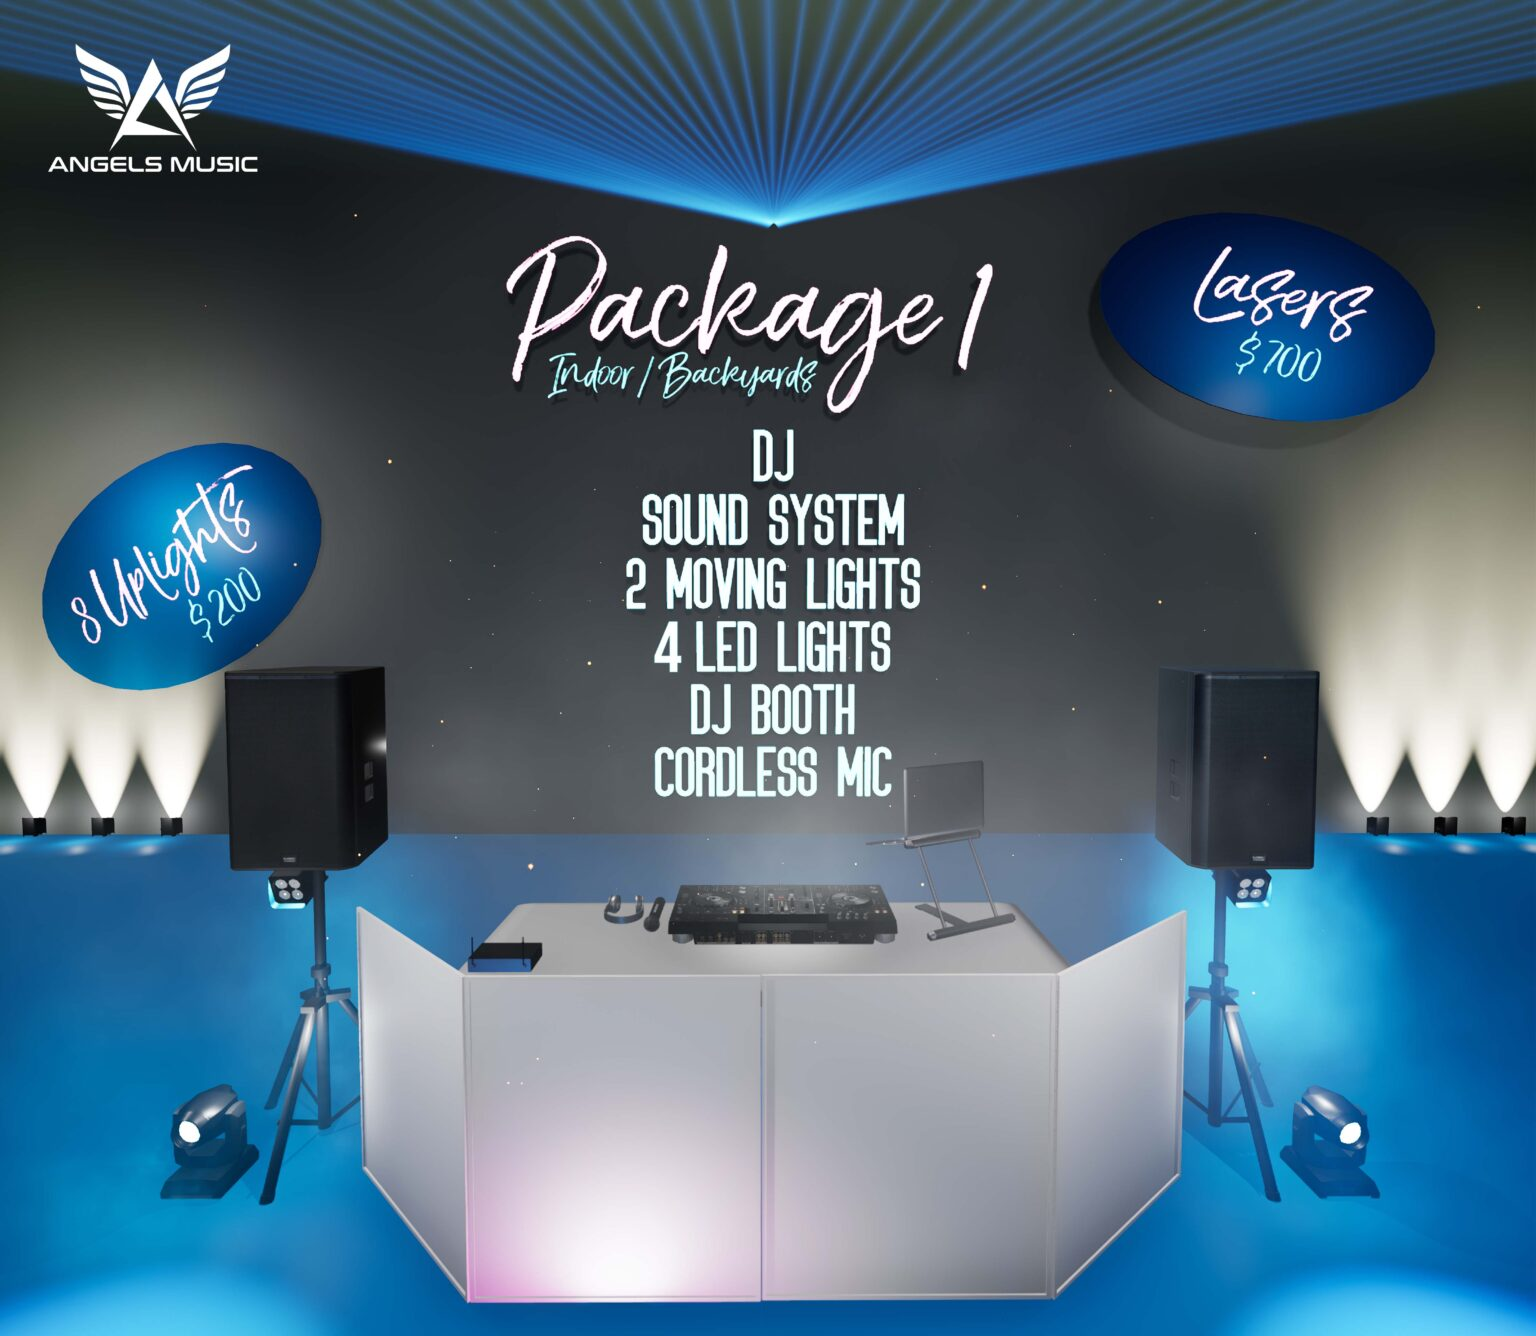 DJ Package, DJ Prices, wedding dj package, birthday dj package, bar mitzvah dj package, wedding dj price,